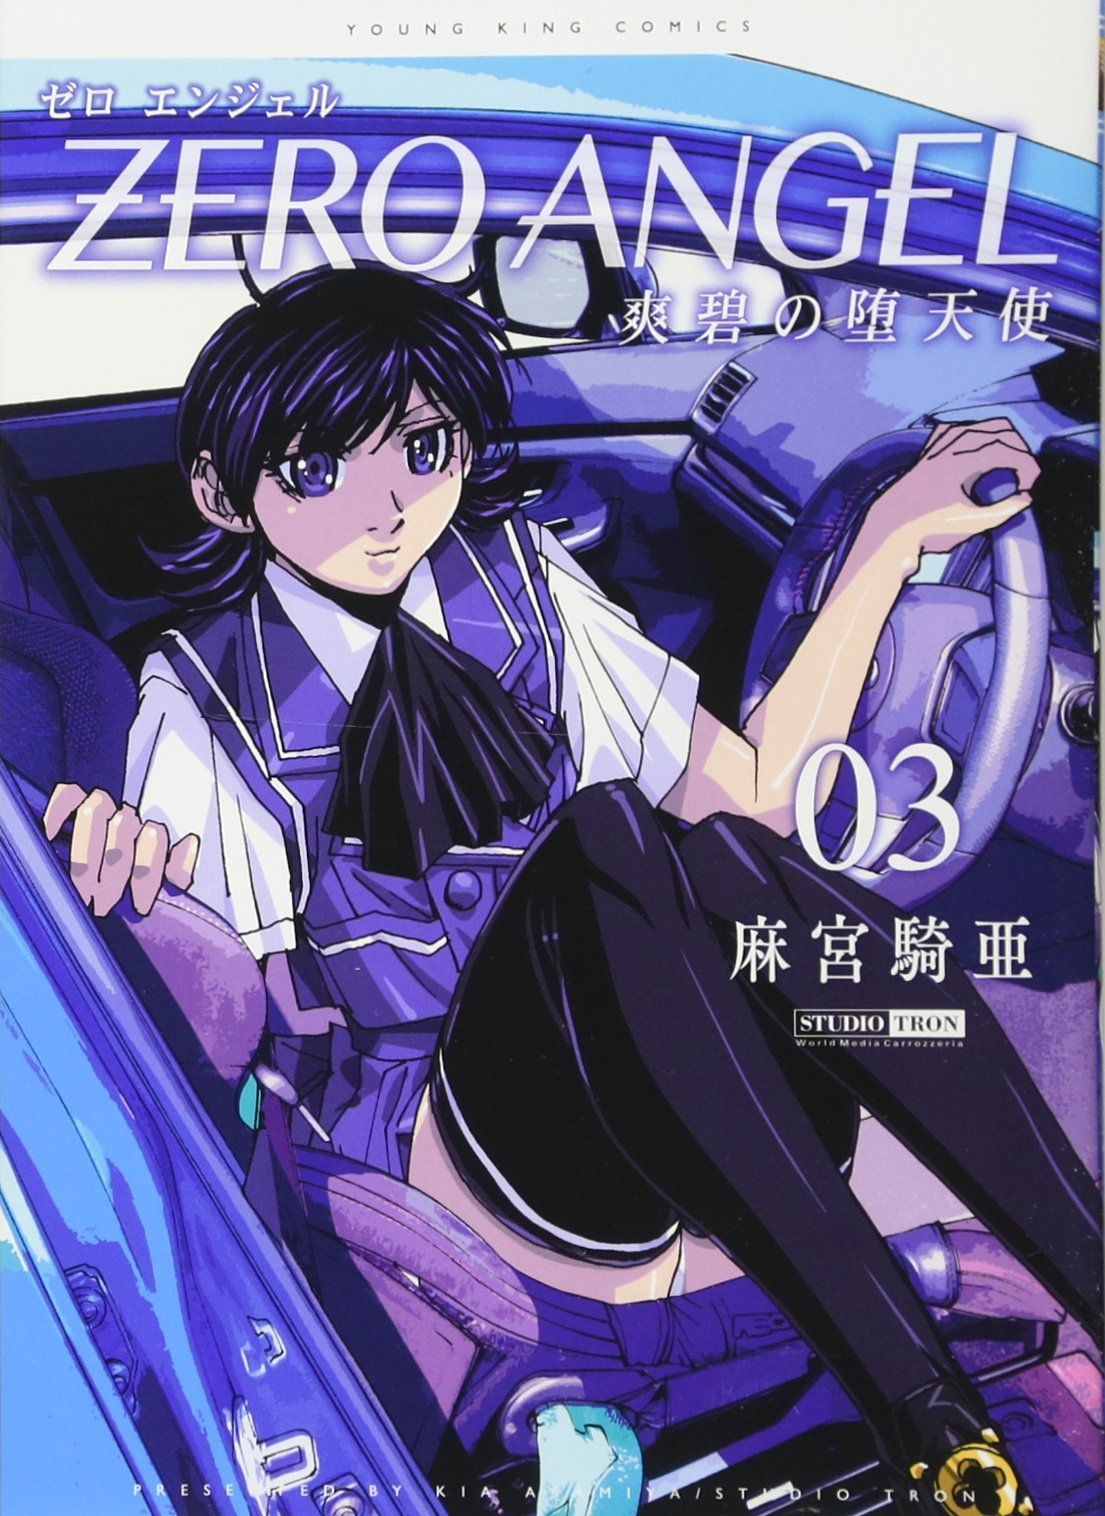 Zero Angel: Souheki no Datenshi